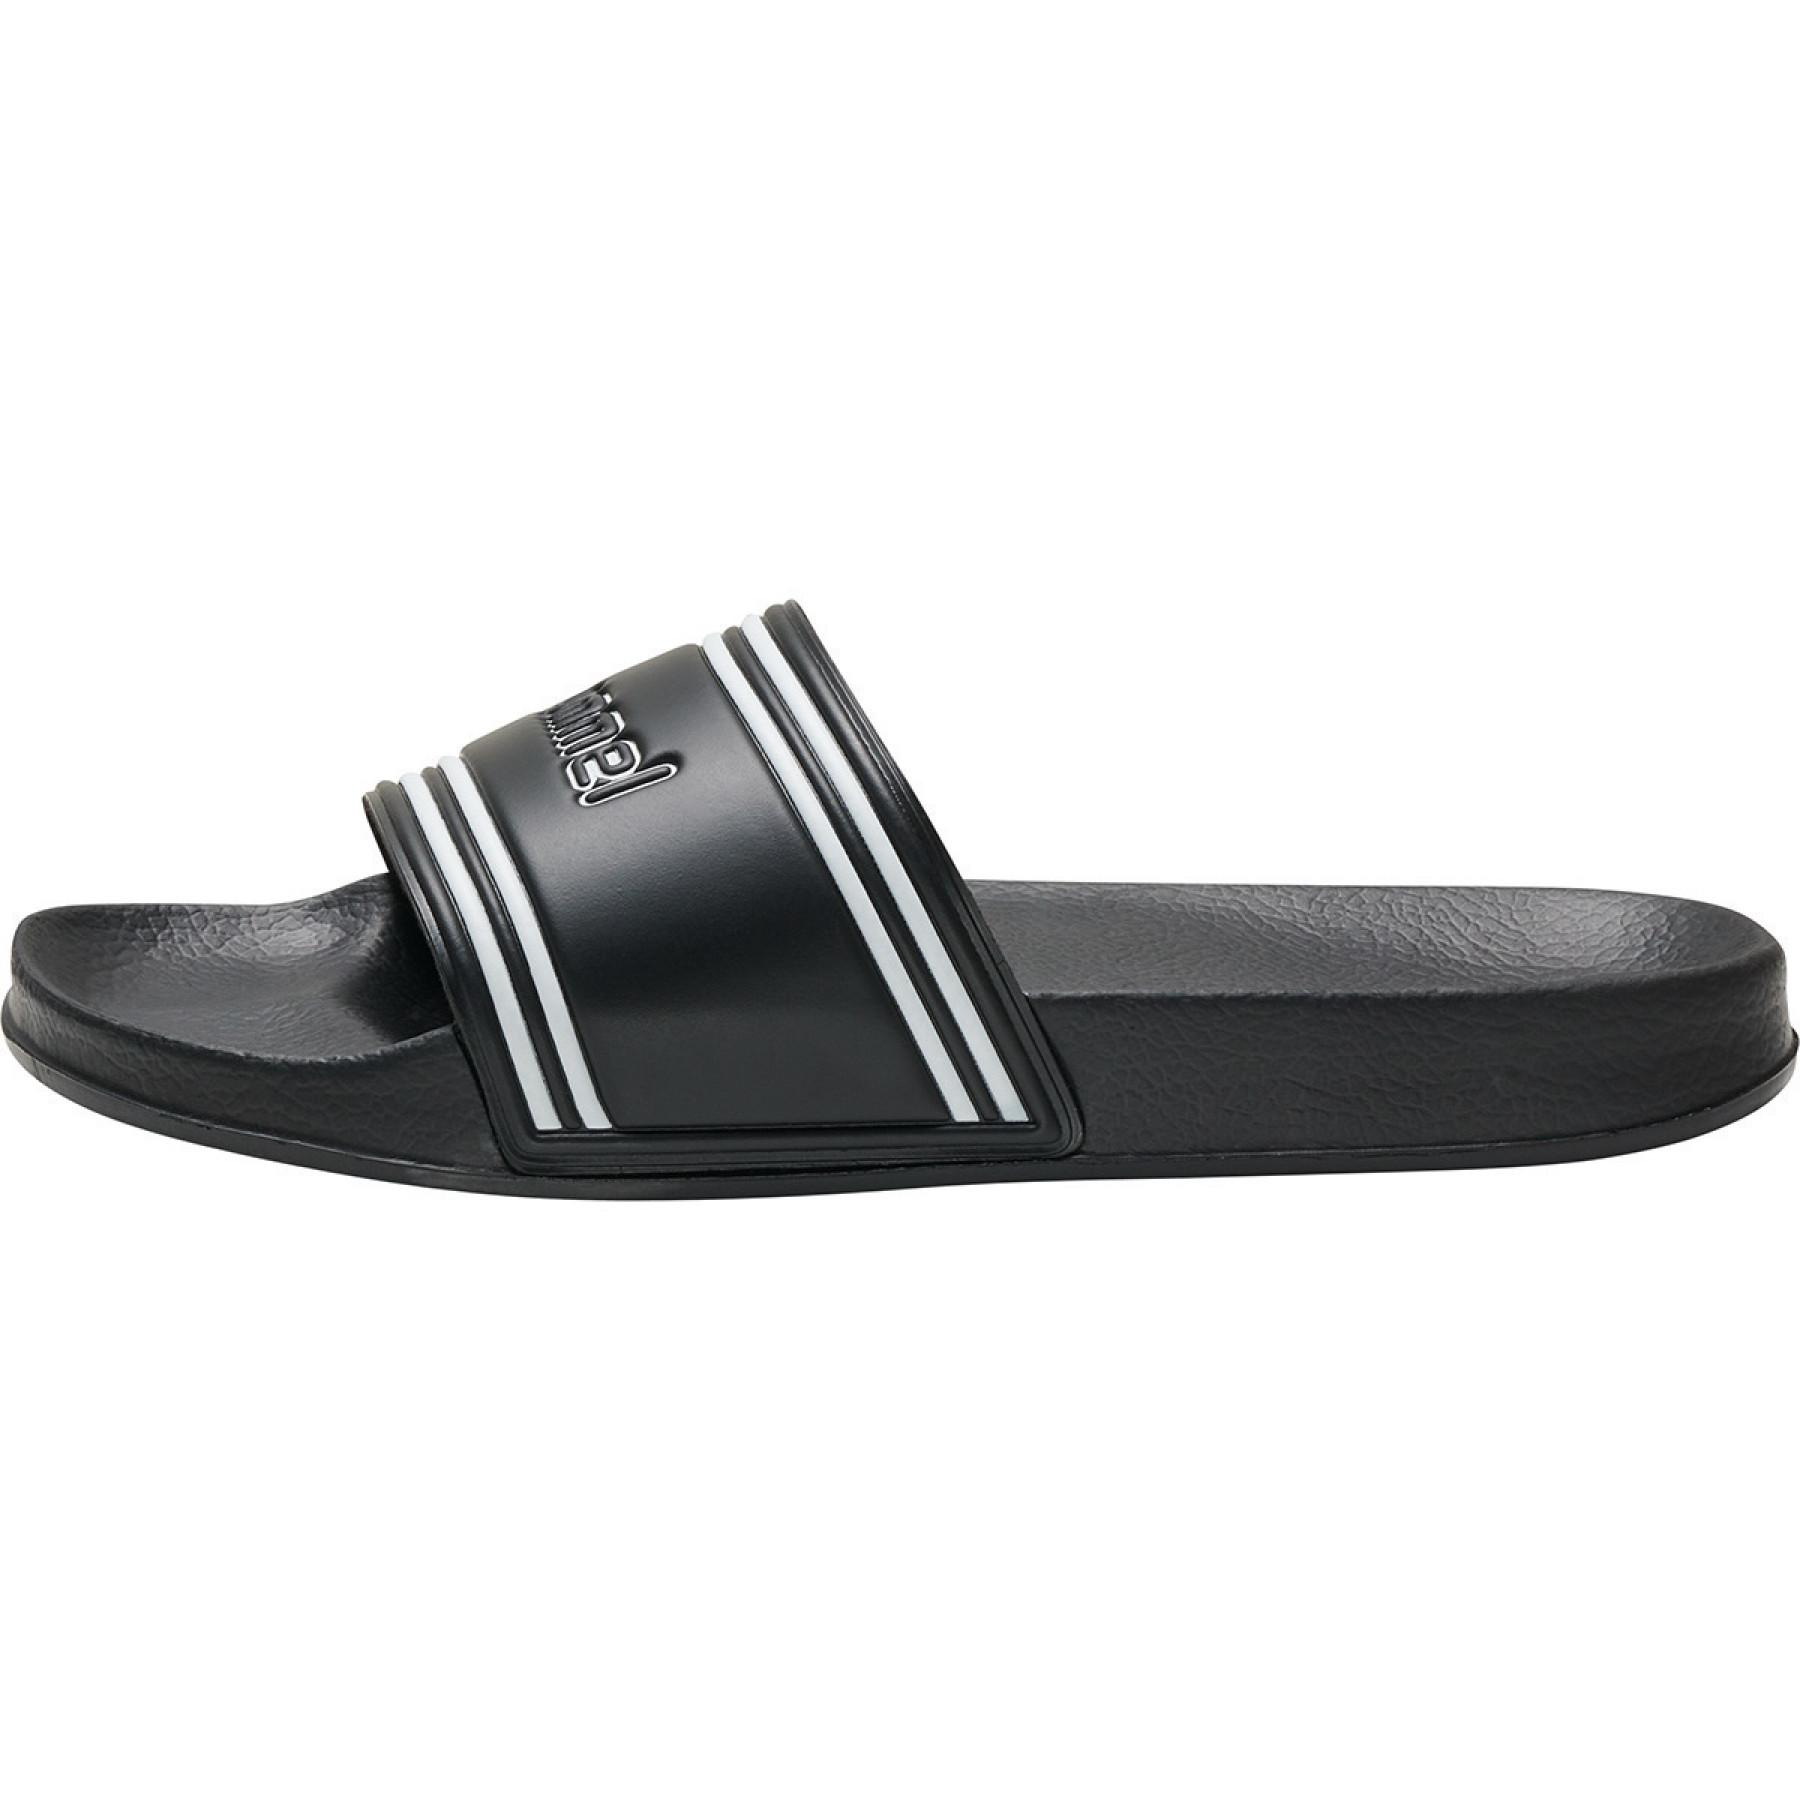 Tap shoes Hummel Pool Slide Retro